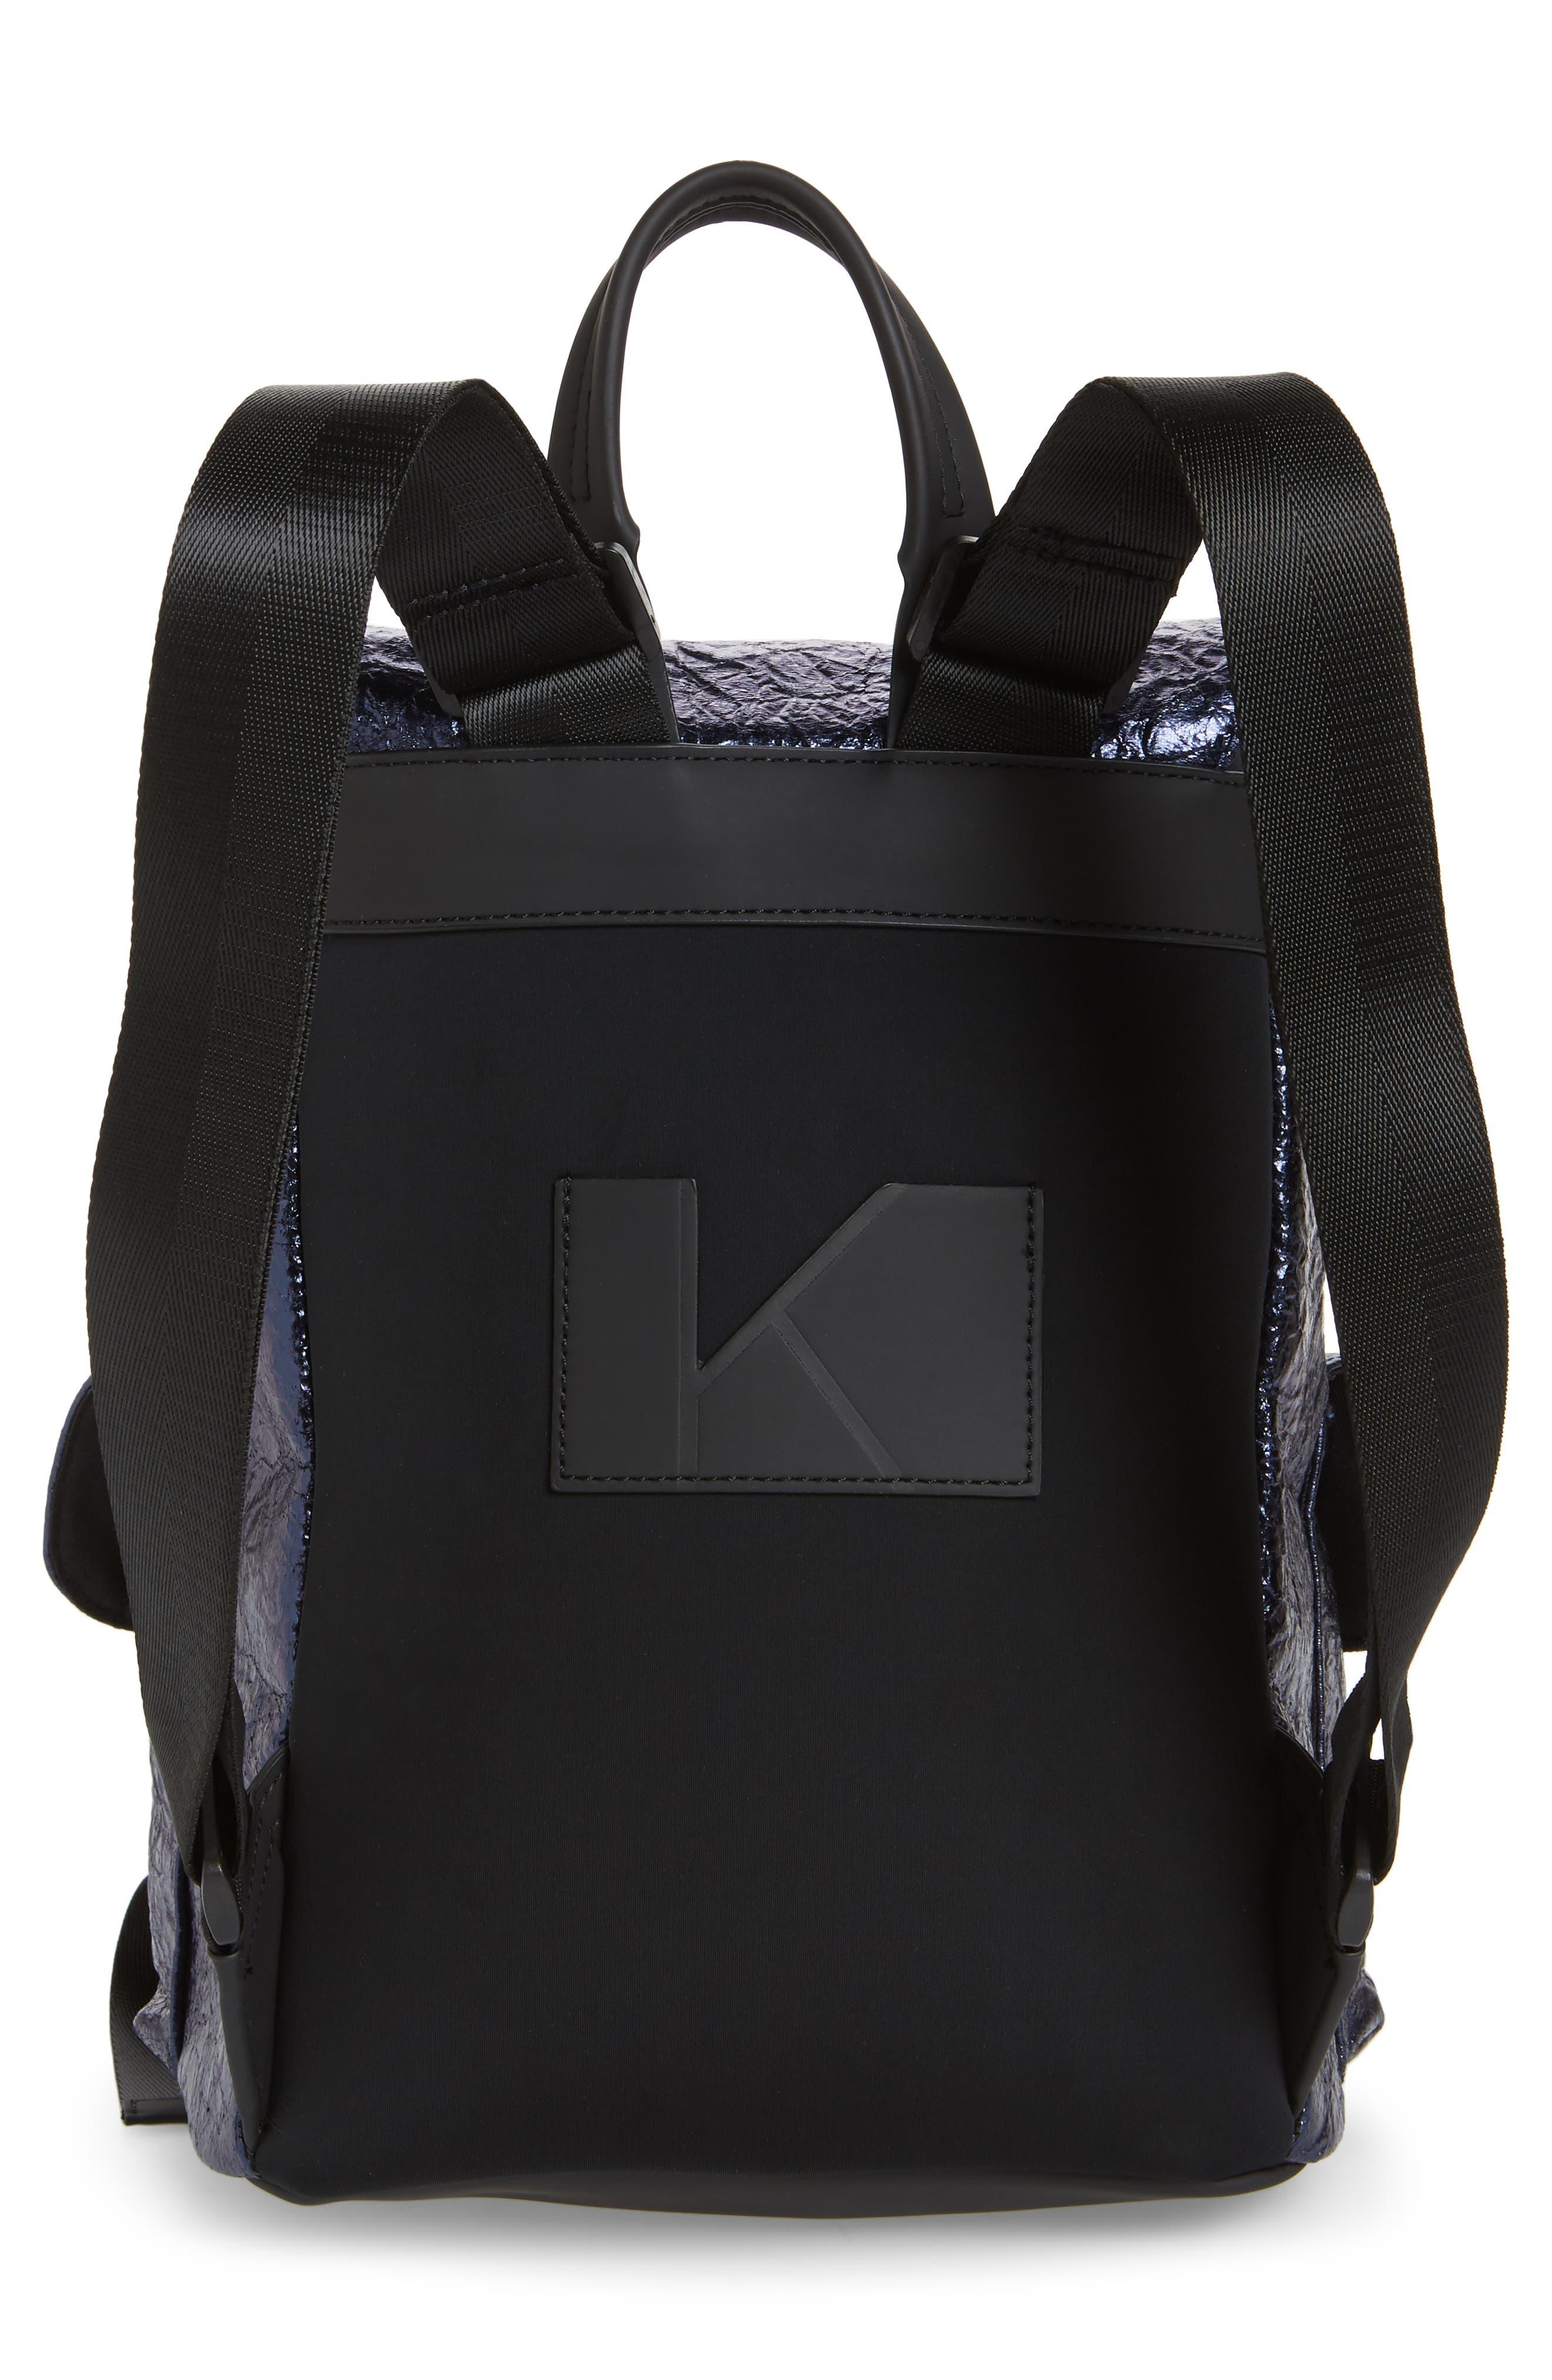 KENDALL + KYLIE,                             Parker Metallic Water Resistant Backpack,                             Alternate thumbnail 3, color,                             400